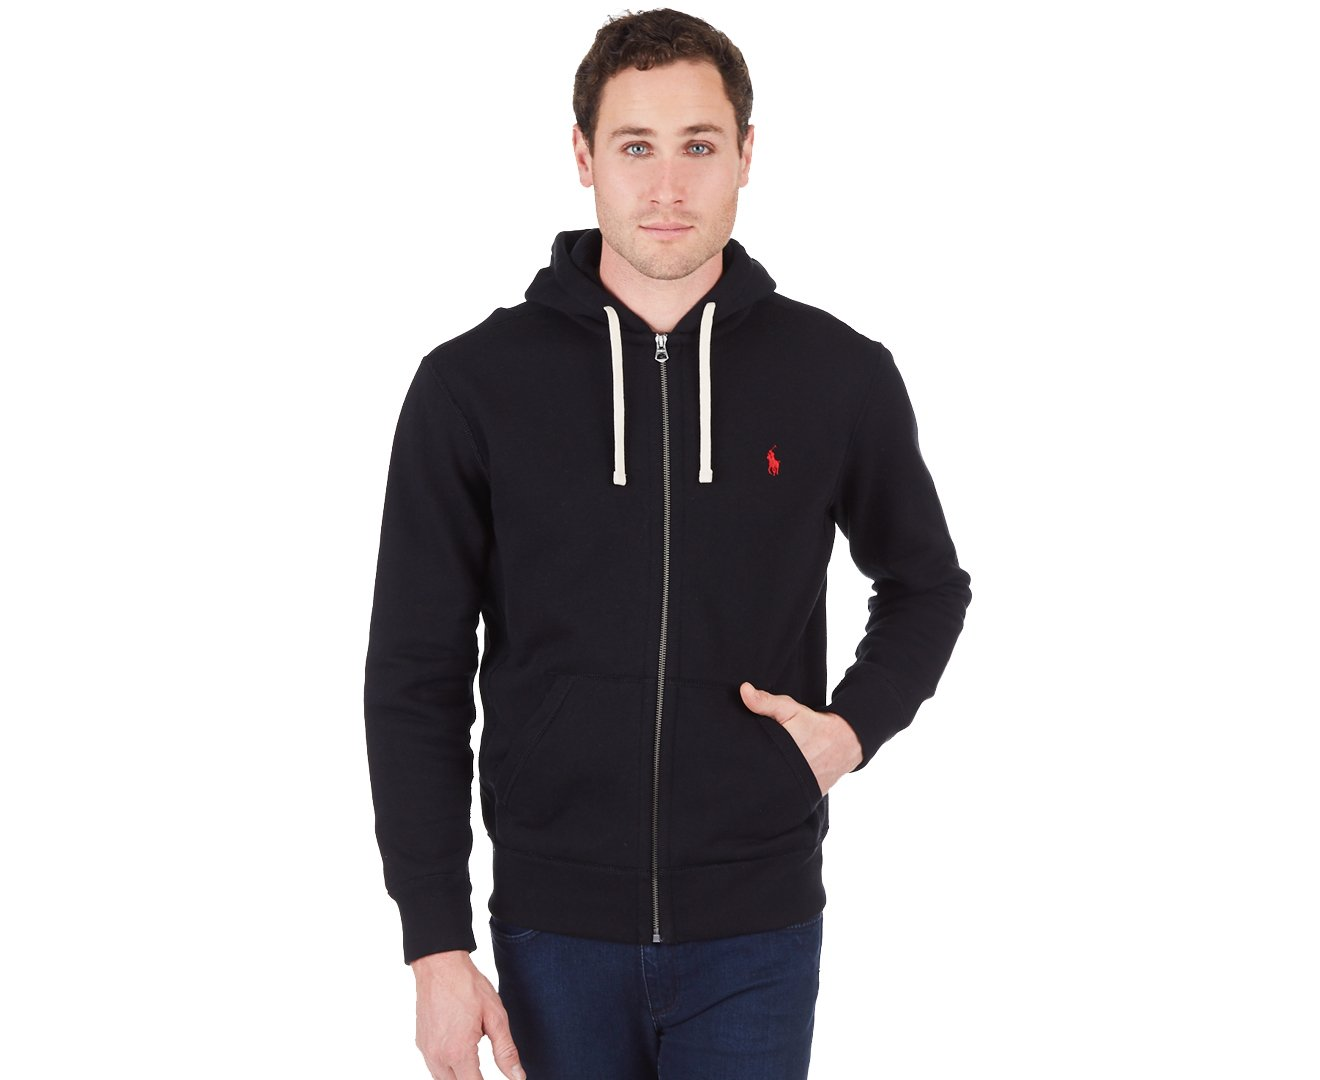 RALPH LAUREN Polo Classic Full-Zip Fleece Hooded Sweatshirt (Large, Black/Red Pony)